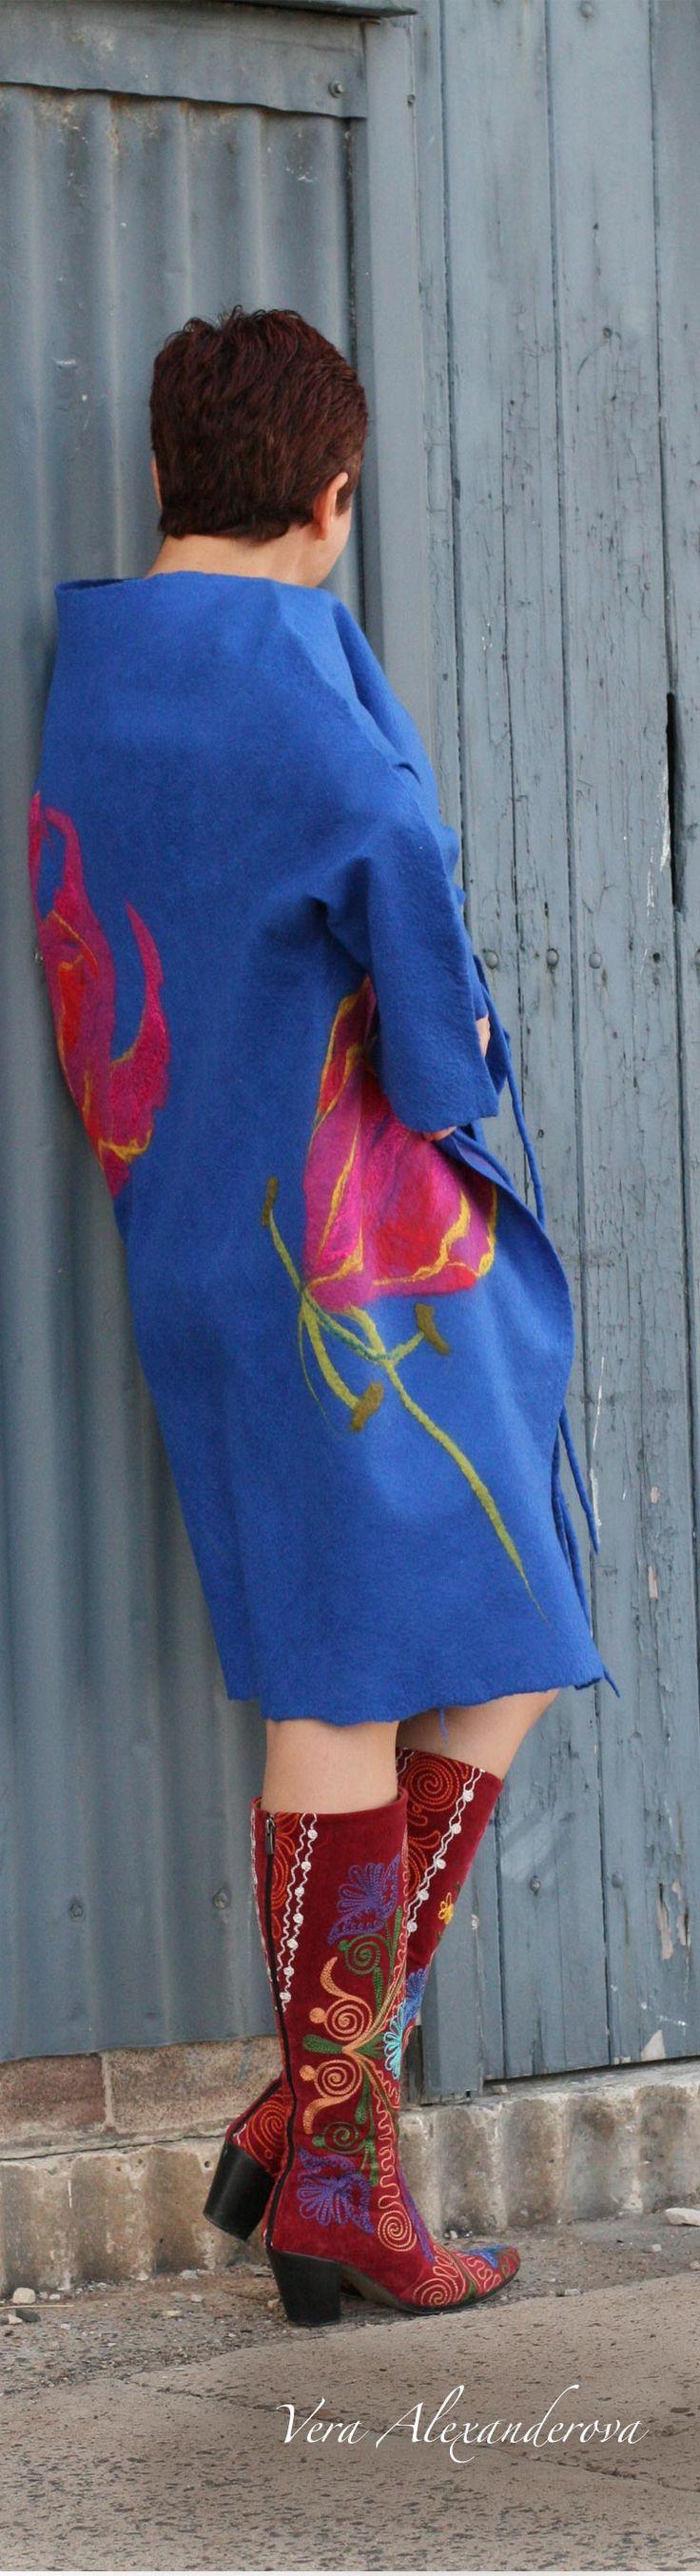 Buy women's fashion style wool summer coat by Vera Alexanderova. #womensfashion #women #fashion #style #boho #bohochic #bohostyle #wearables #unique #ecofashion